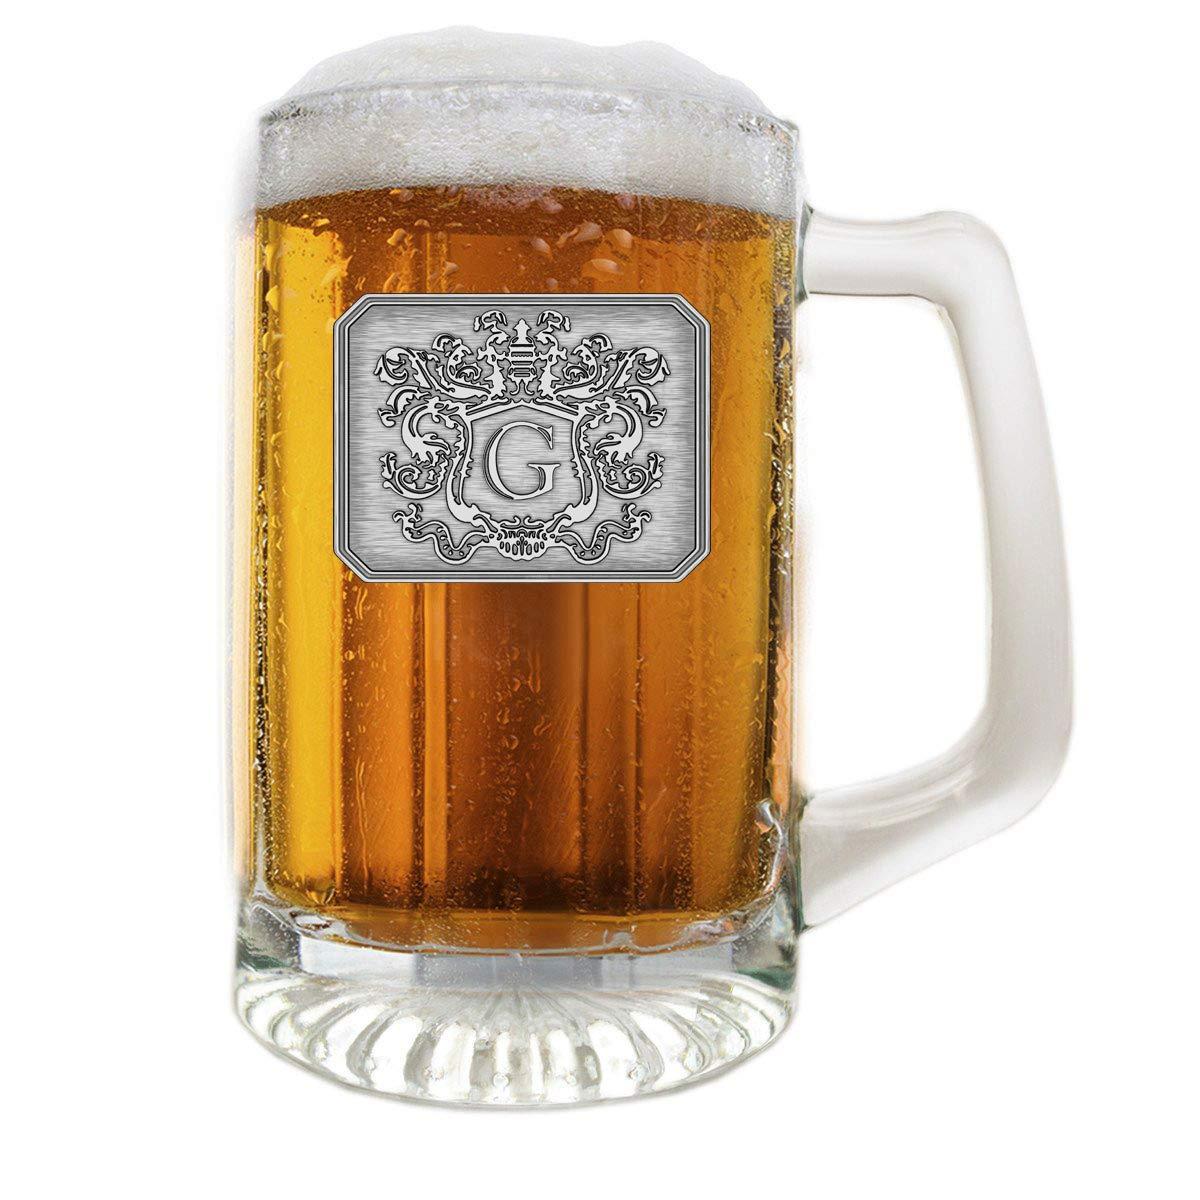 Fine Occasion Glass Beer Pub Mug Monogram Initial Pewter Engraved Crest with Letter G, 25 oz